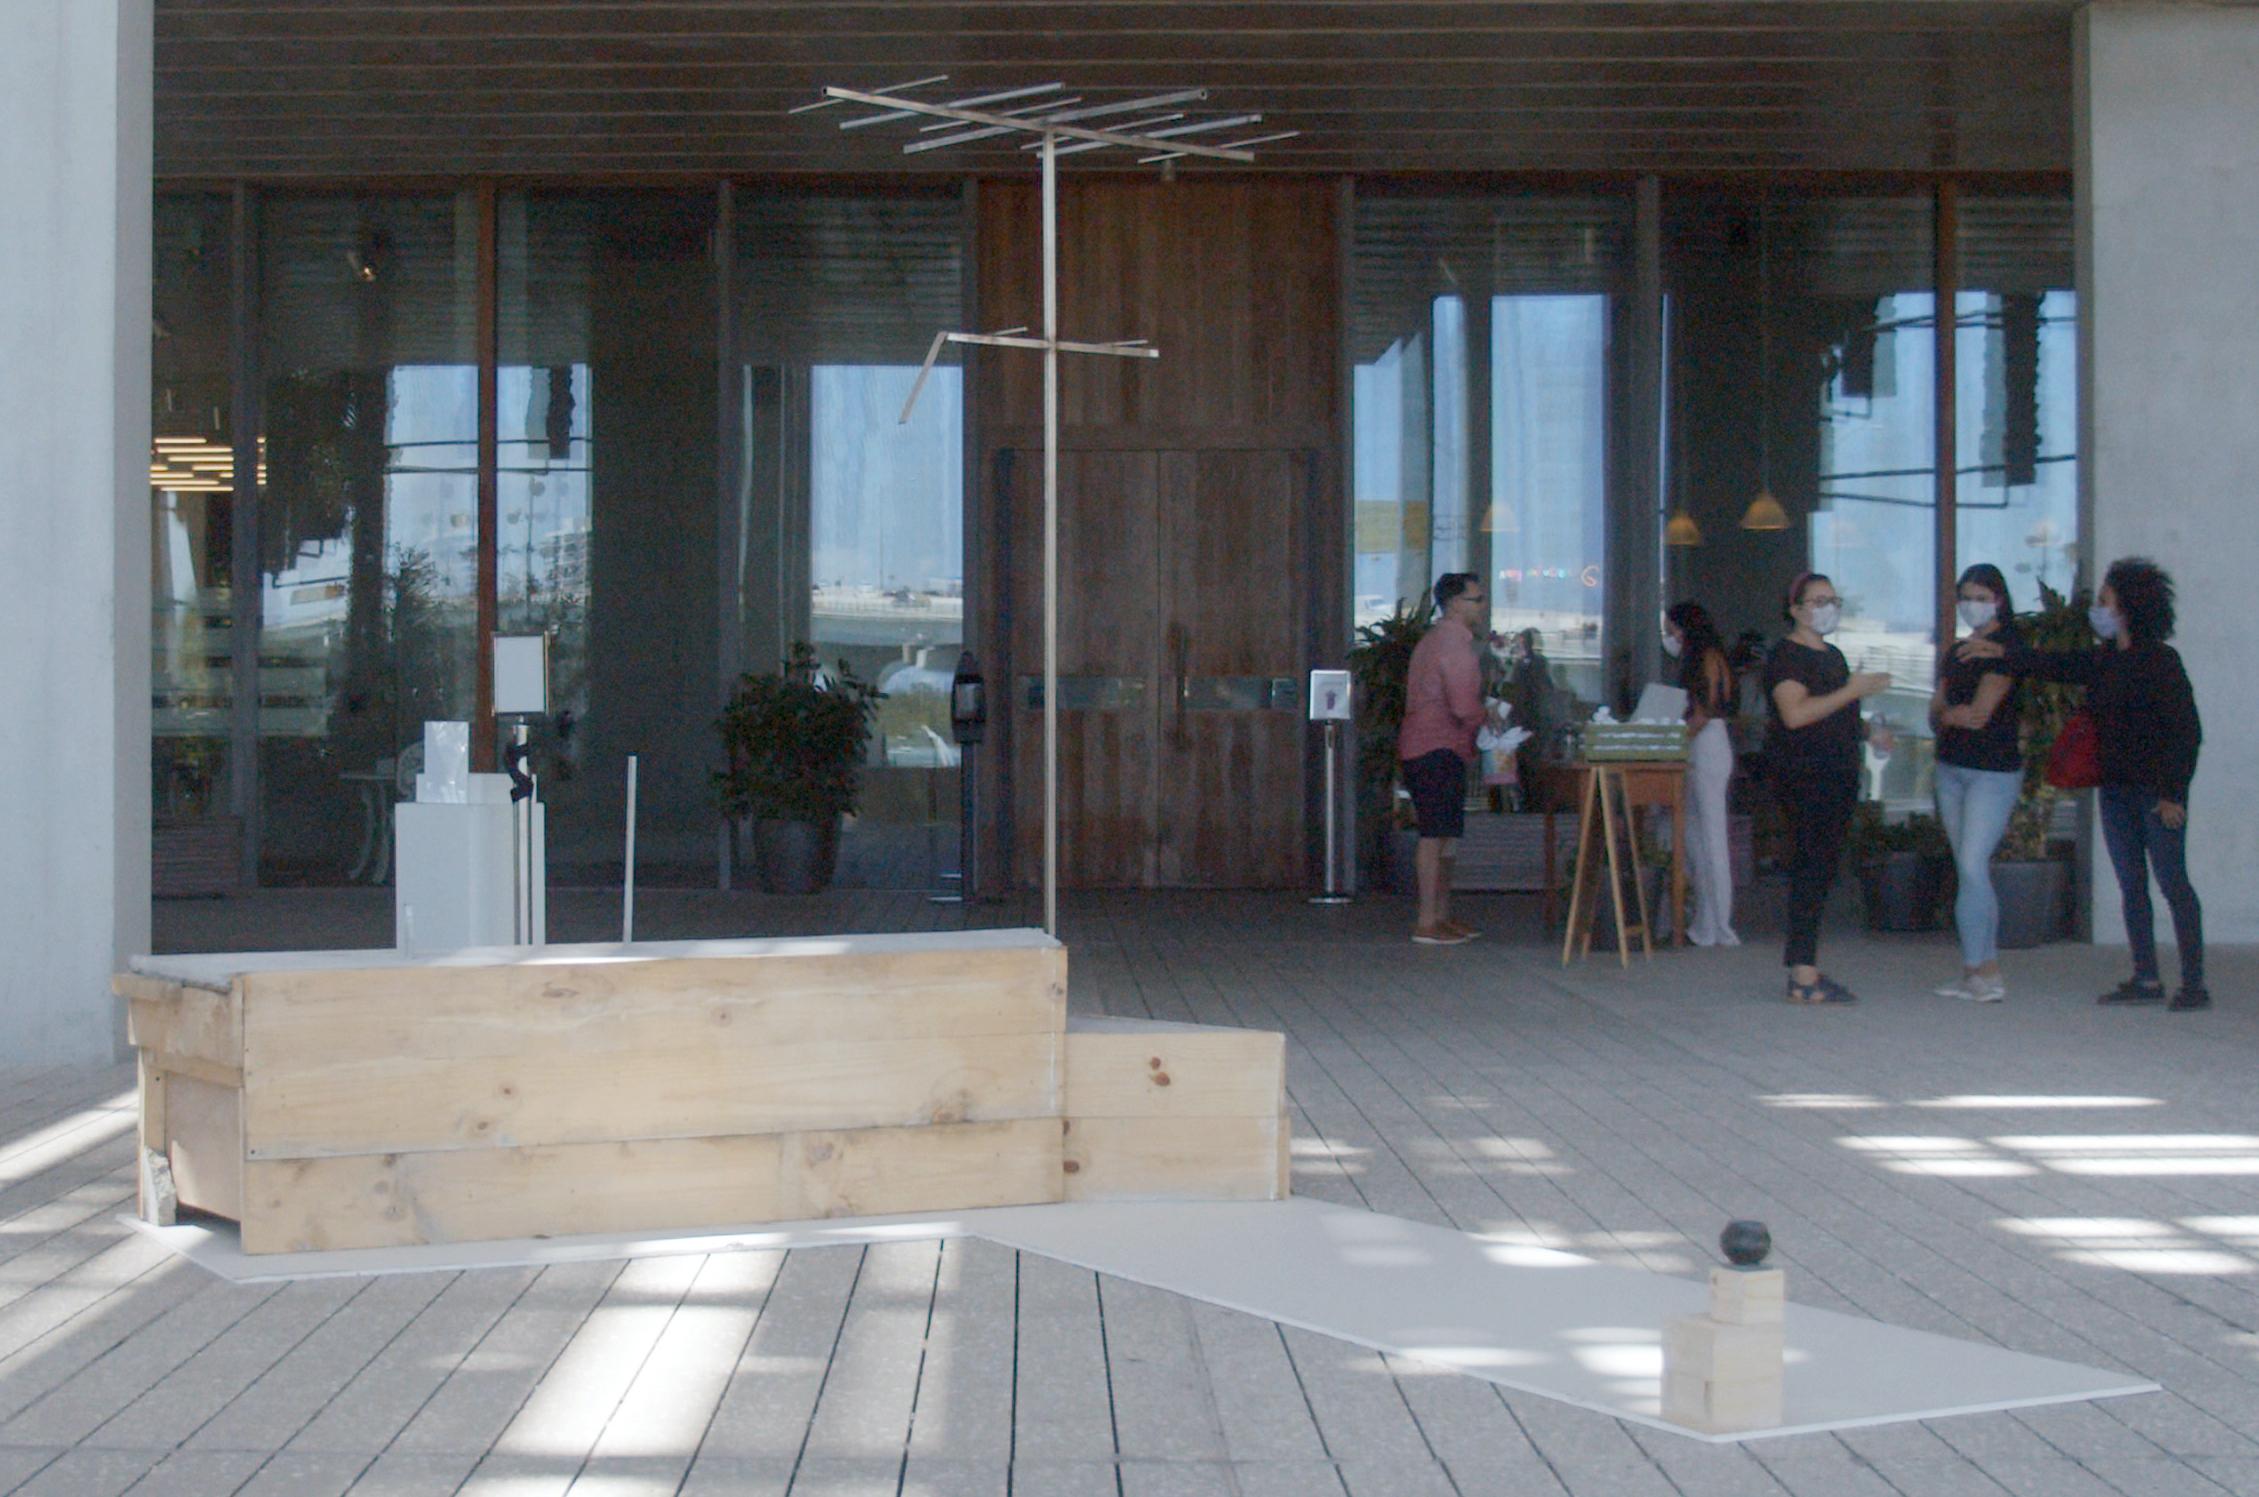 anira Collado, MY BODY, MY RULES, 2021 (installation view), Pérez Art Museum Miami, Miami, FL